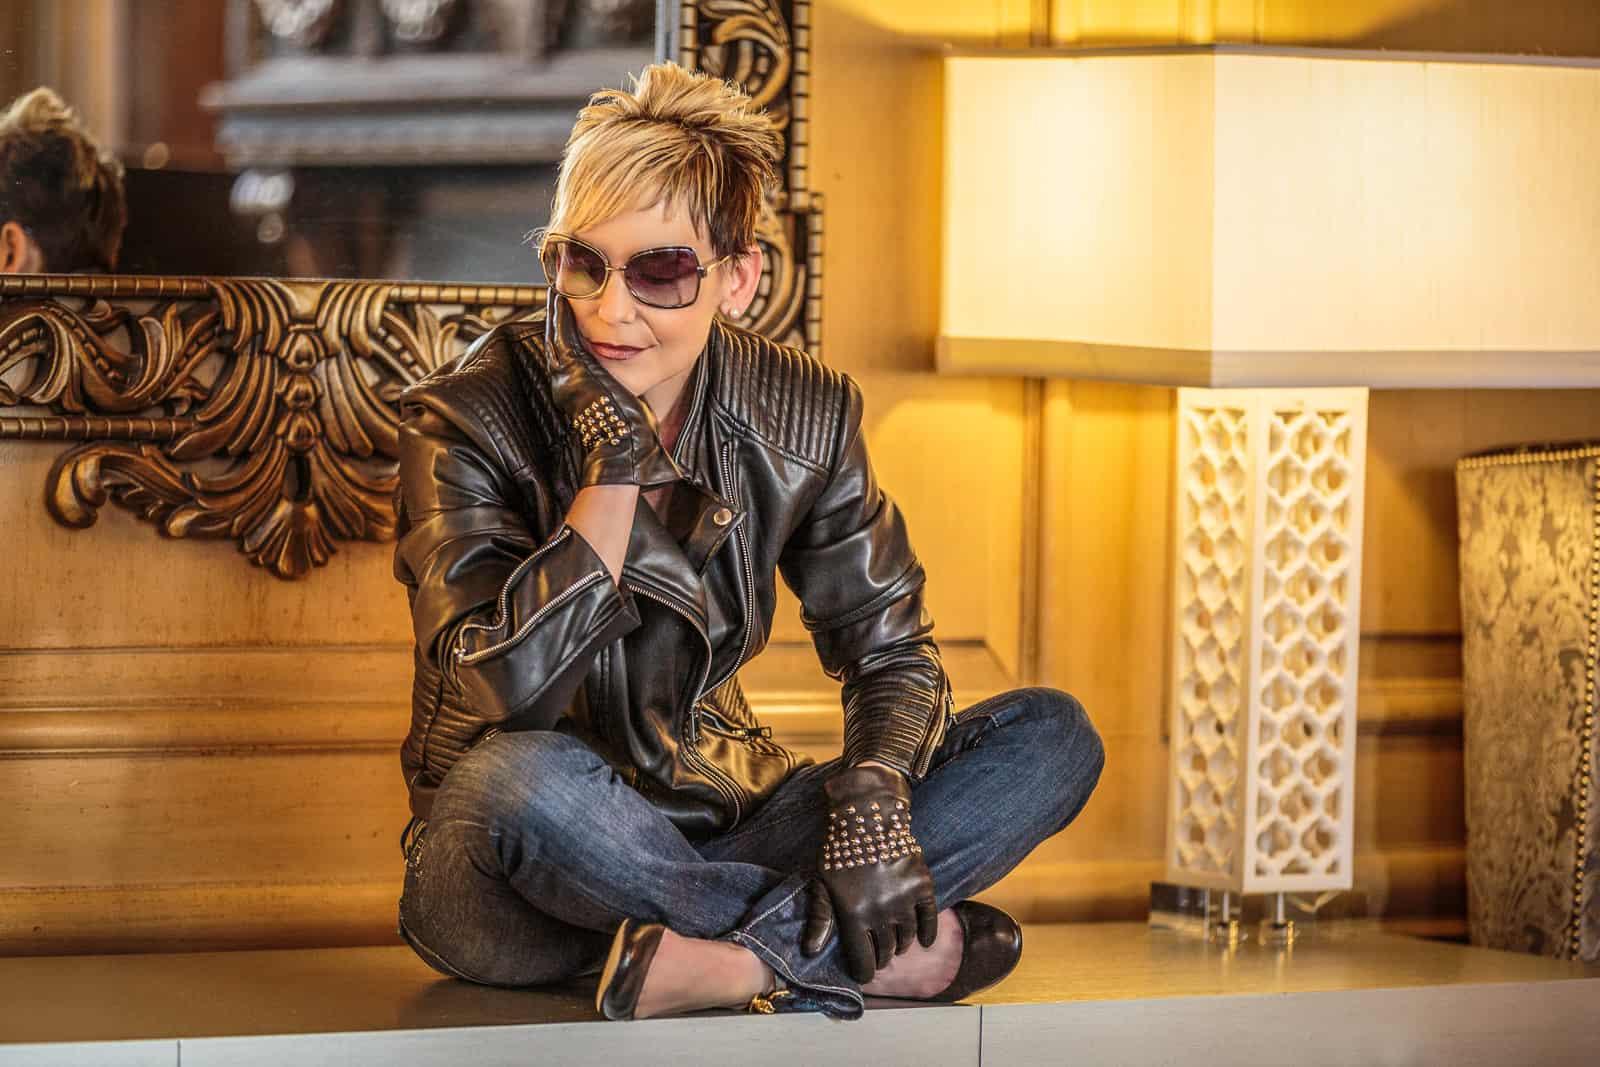 beau-gant-gloves-metal-studs-black-fashion